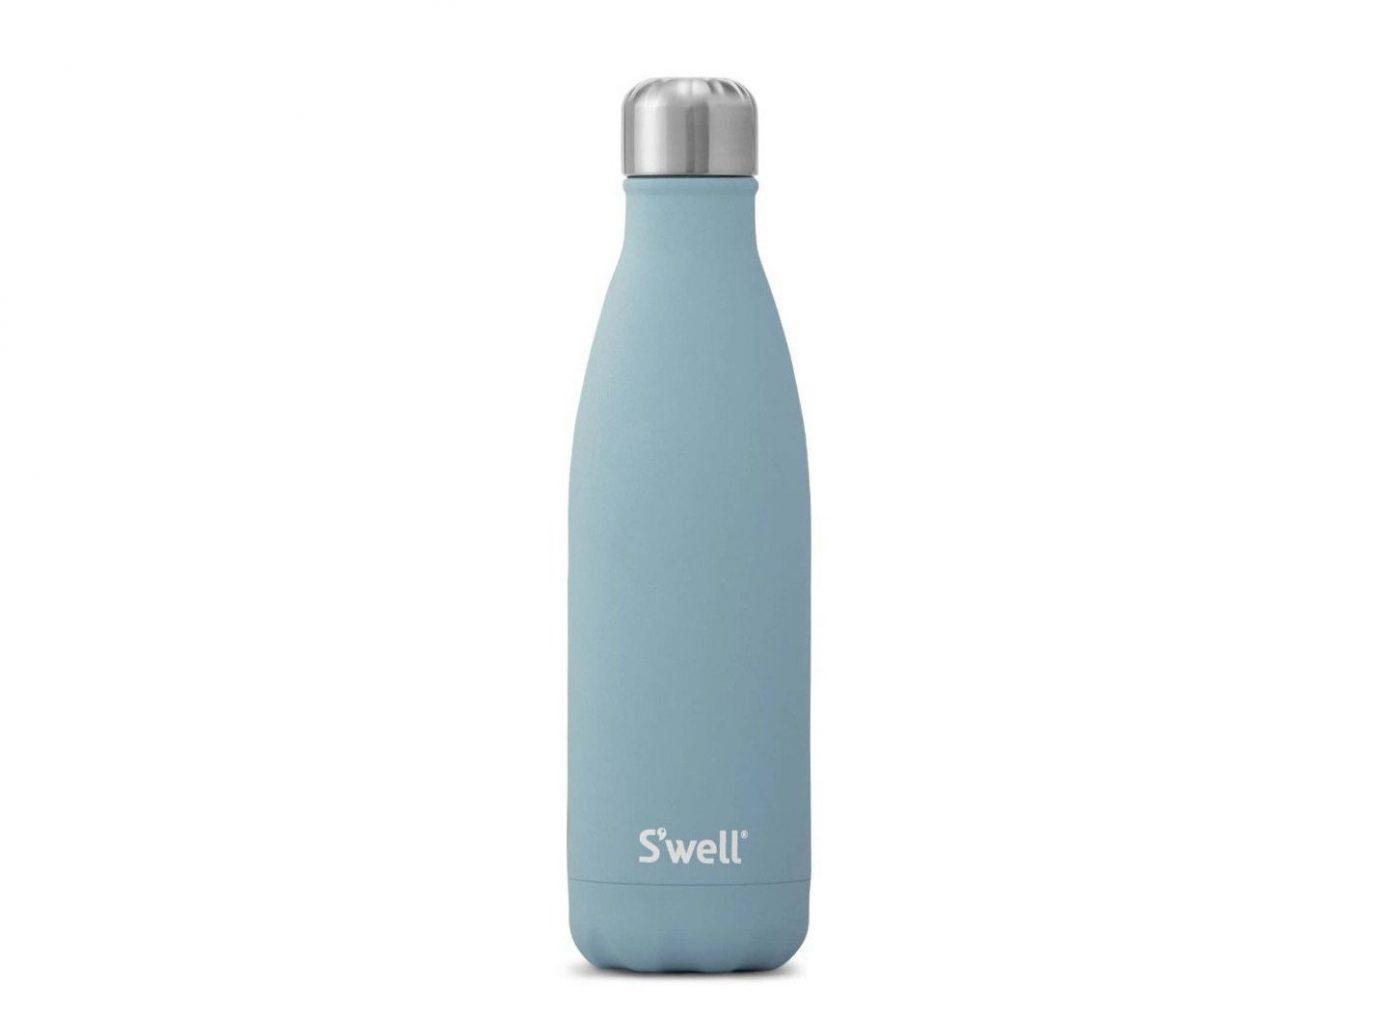 Flights Travel Shop bottle water bottle glass bottle product plastic bottle product design drinkware liquid water